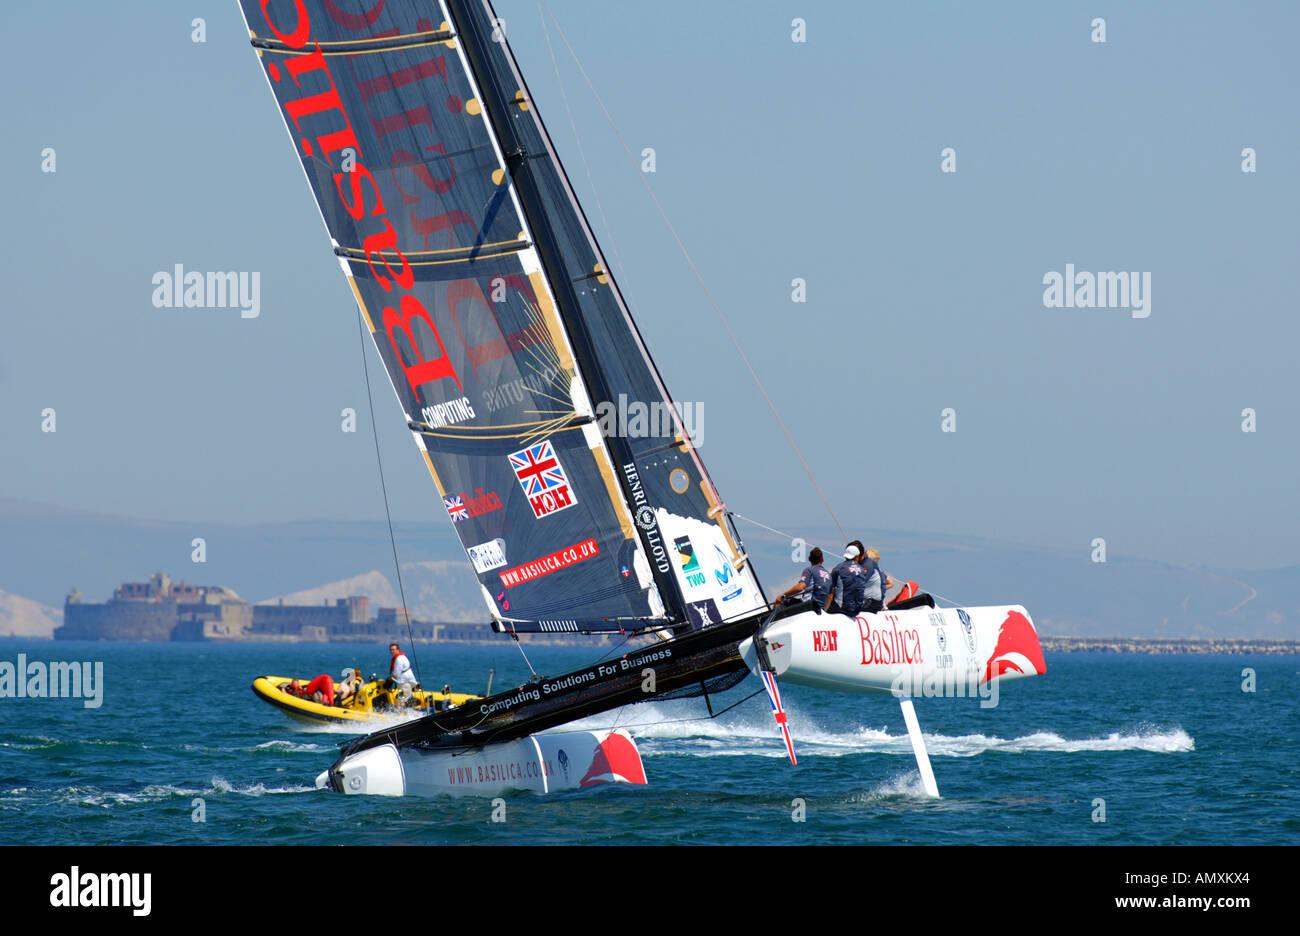 Catamaran. yacht, yachting, sailing, Weymouth and Portland Sailing Academy Dorset Britain UK - Stock Image